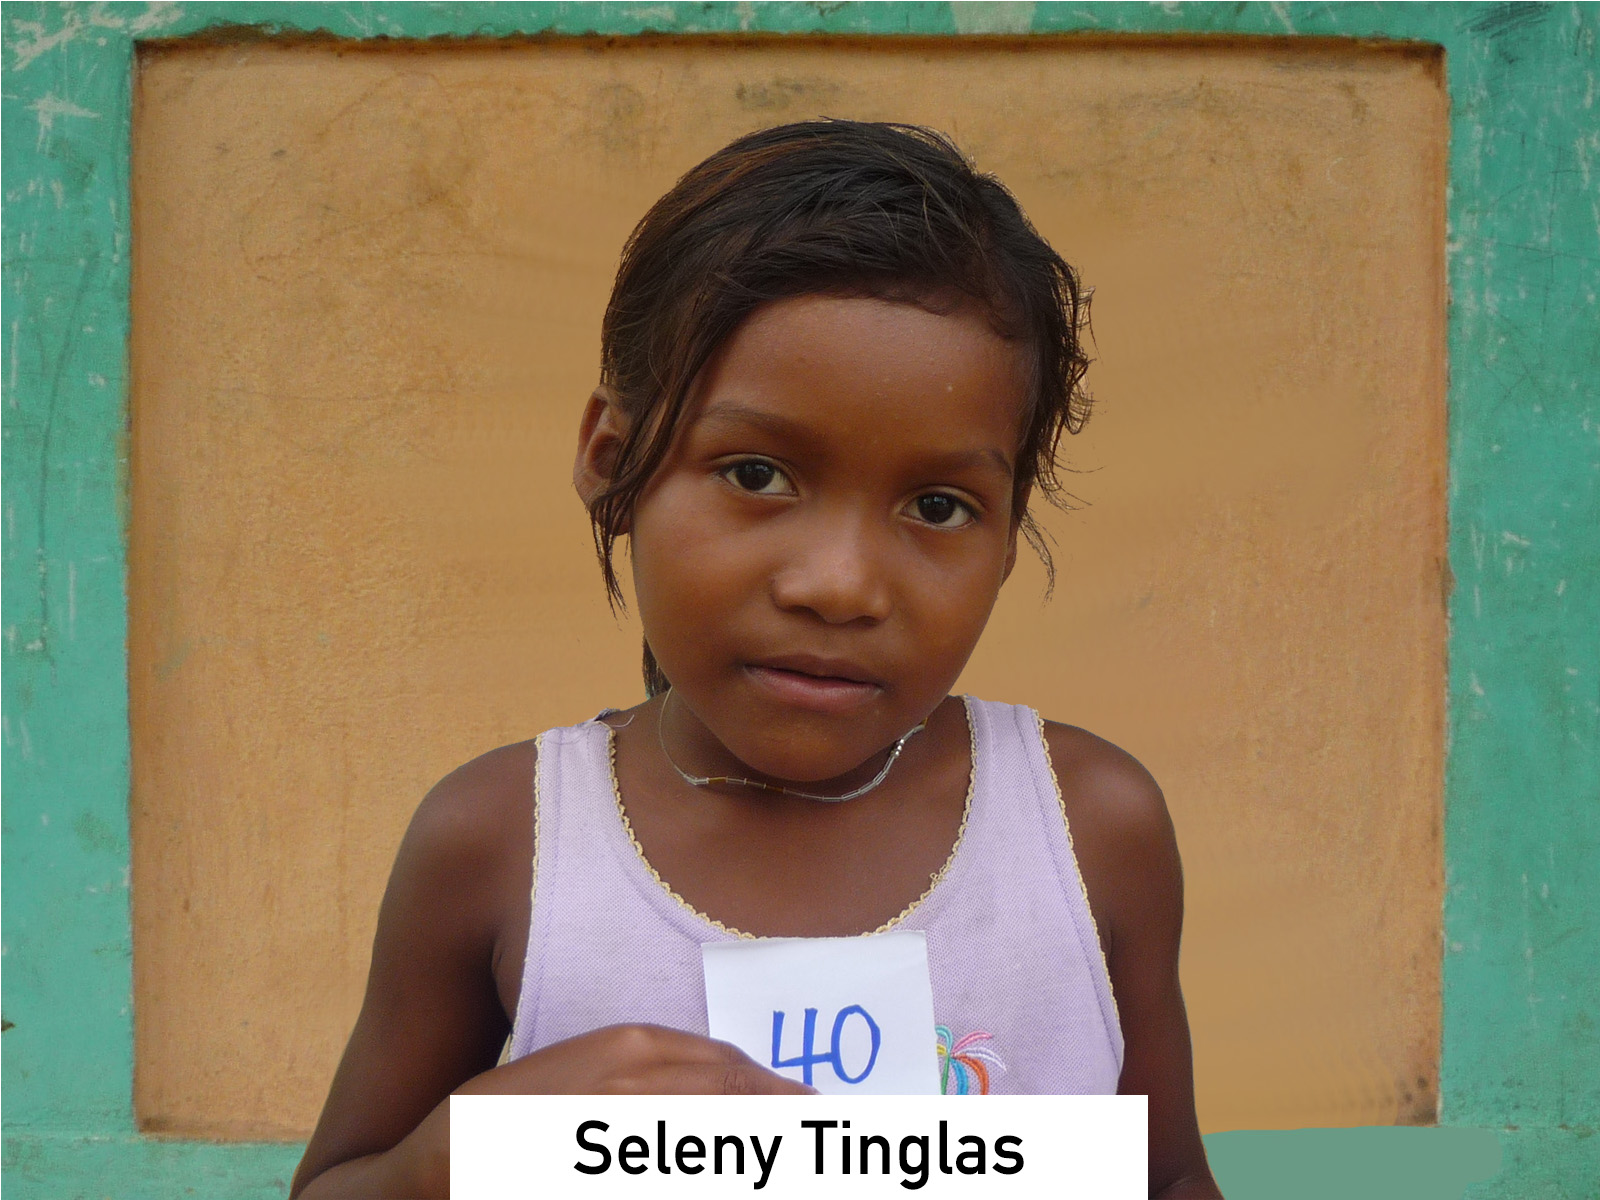 040 - Seleny Tinglas.jpg